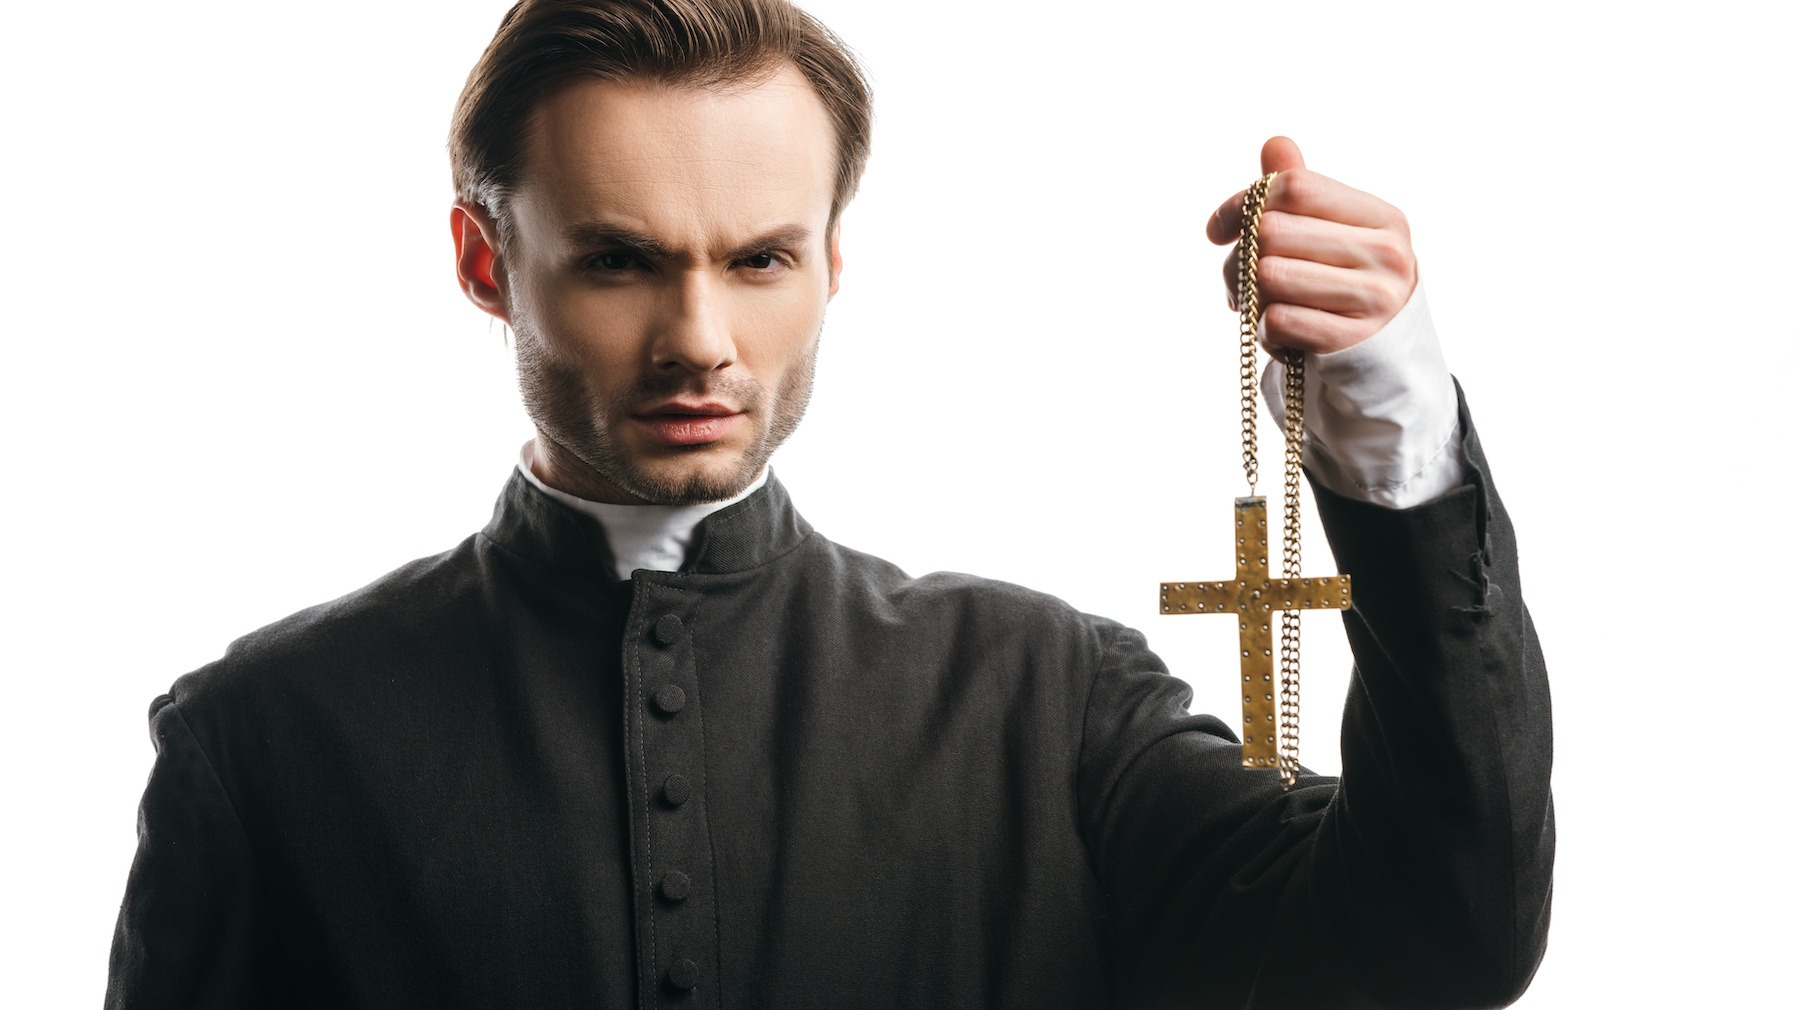 priest with golden cross